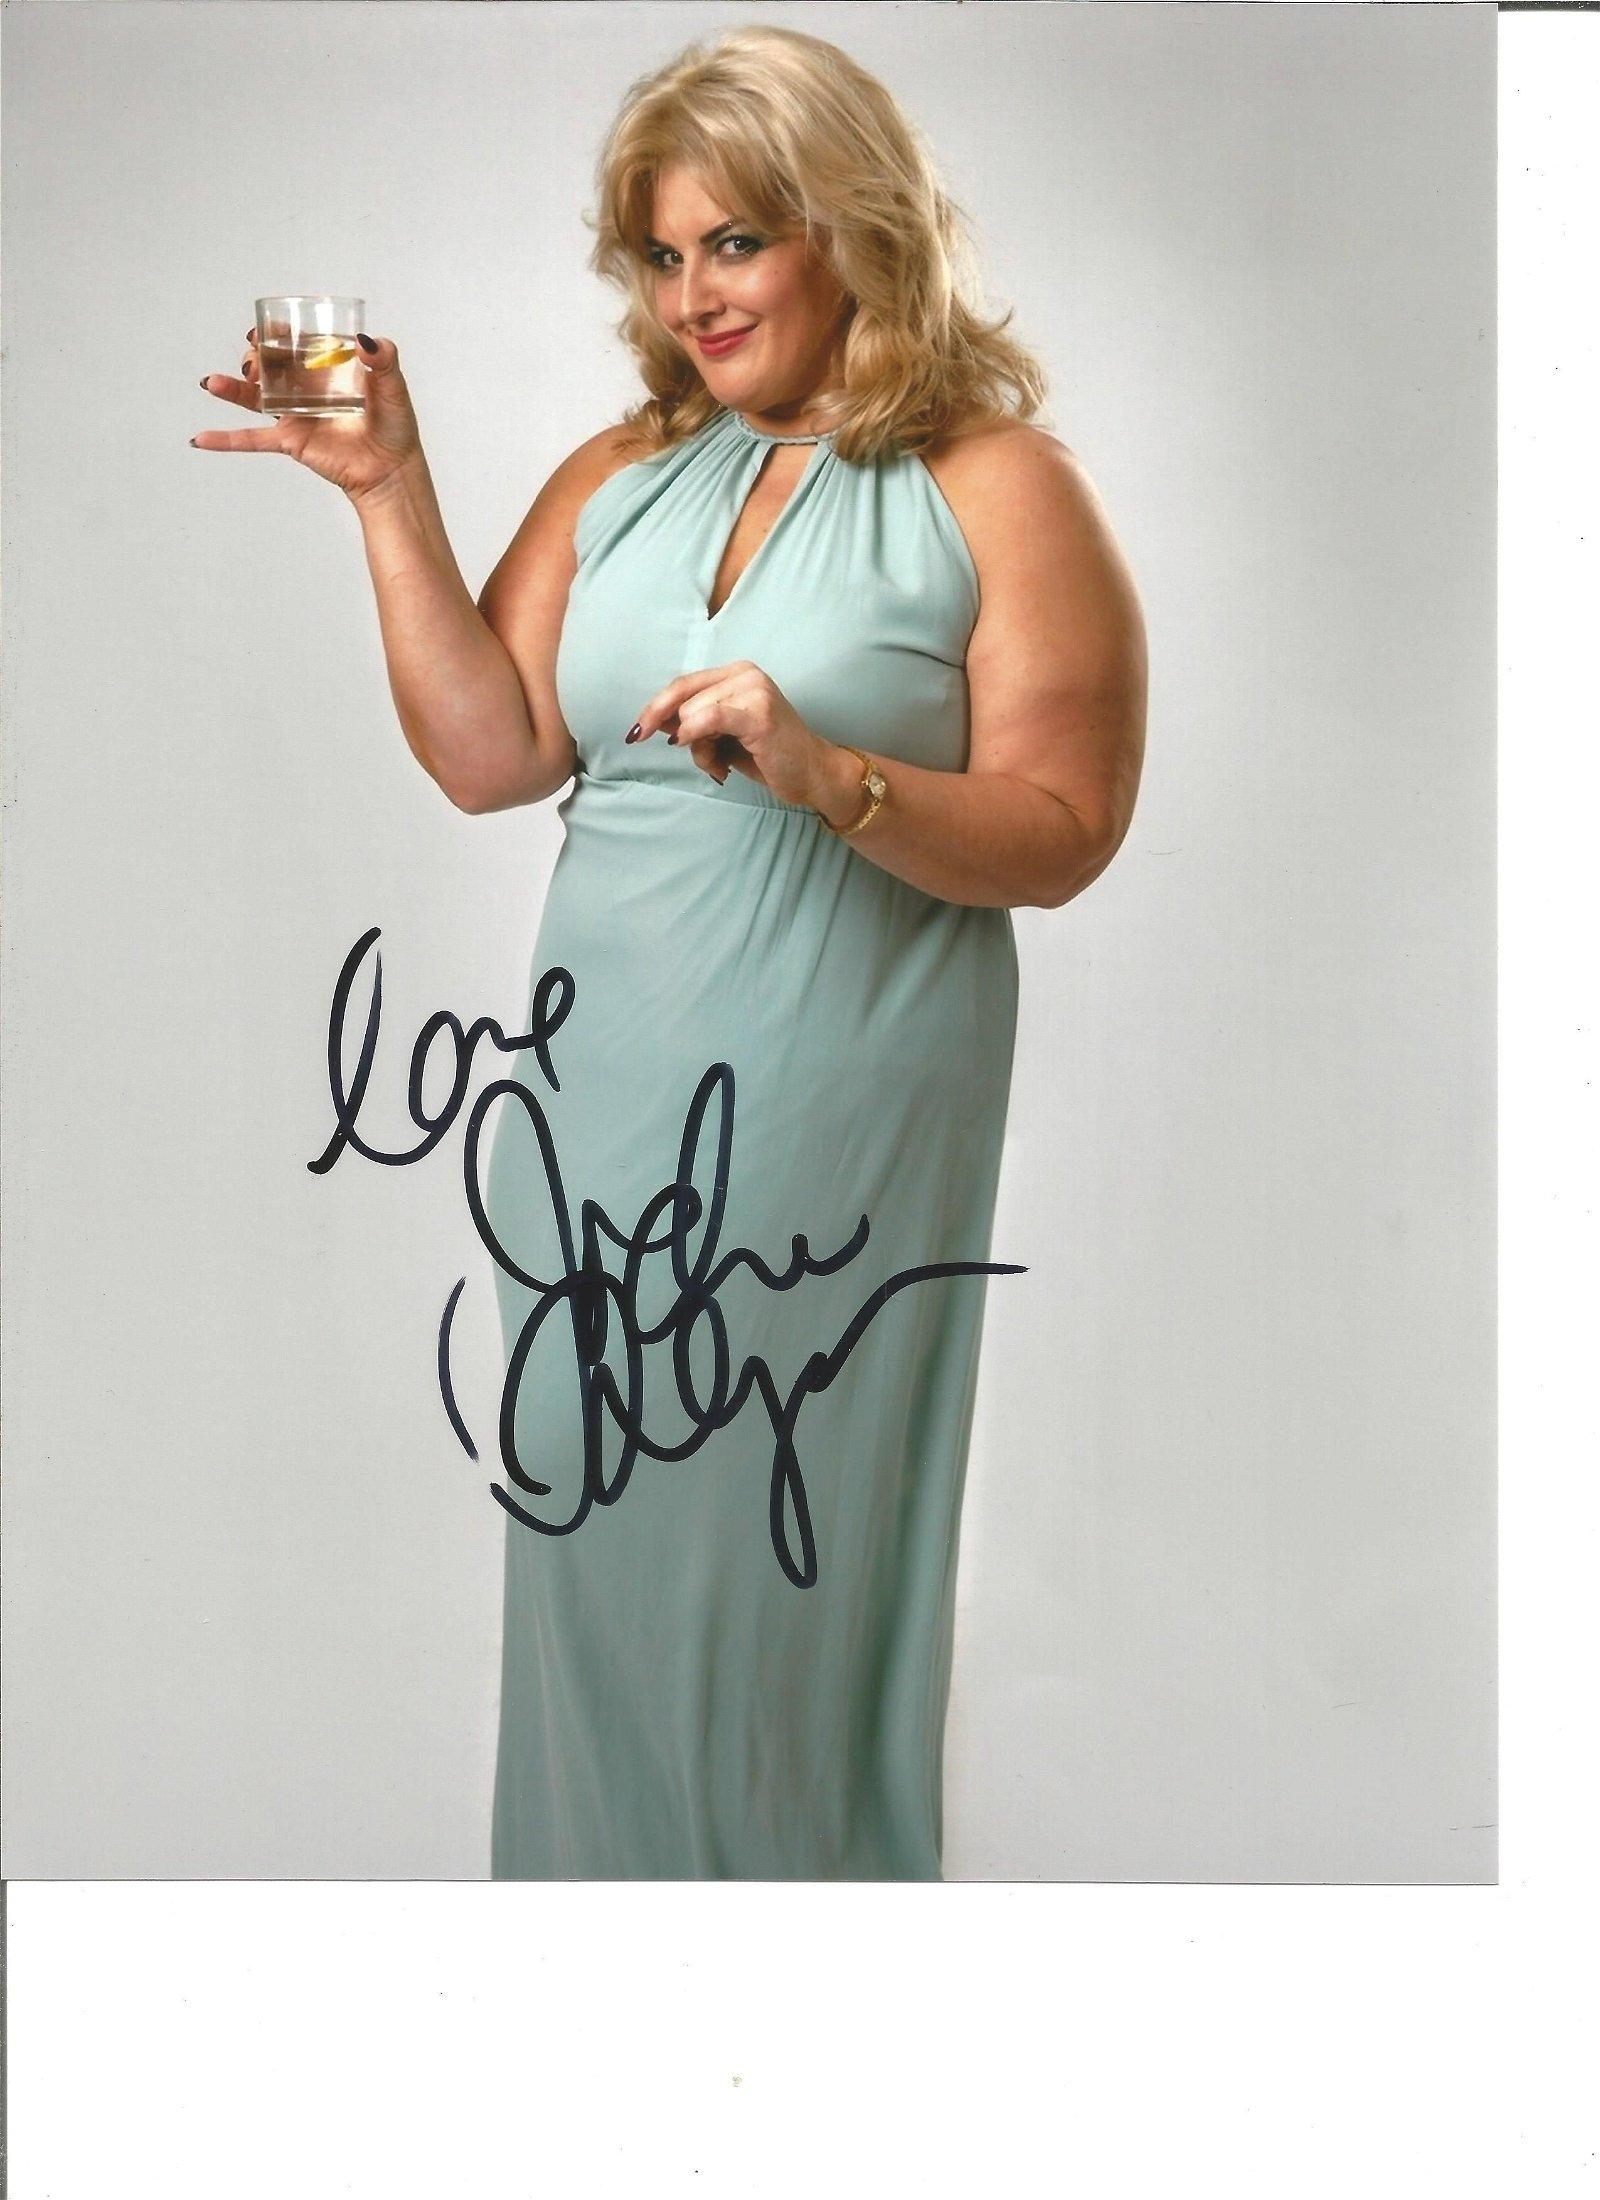 Jodie Prenger Actress Singer Signed 8x10 Photo. Good